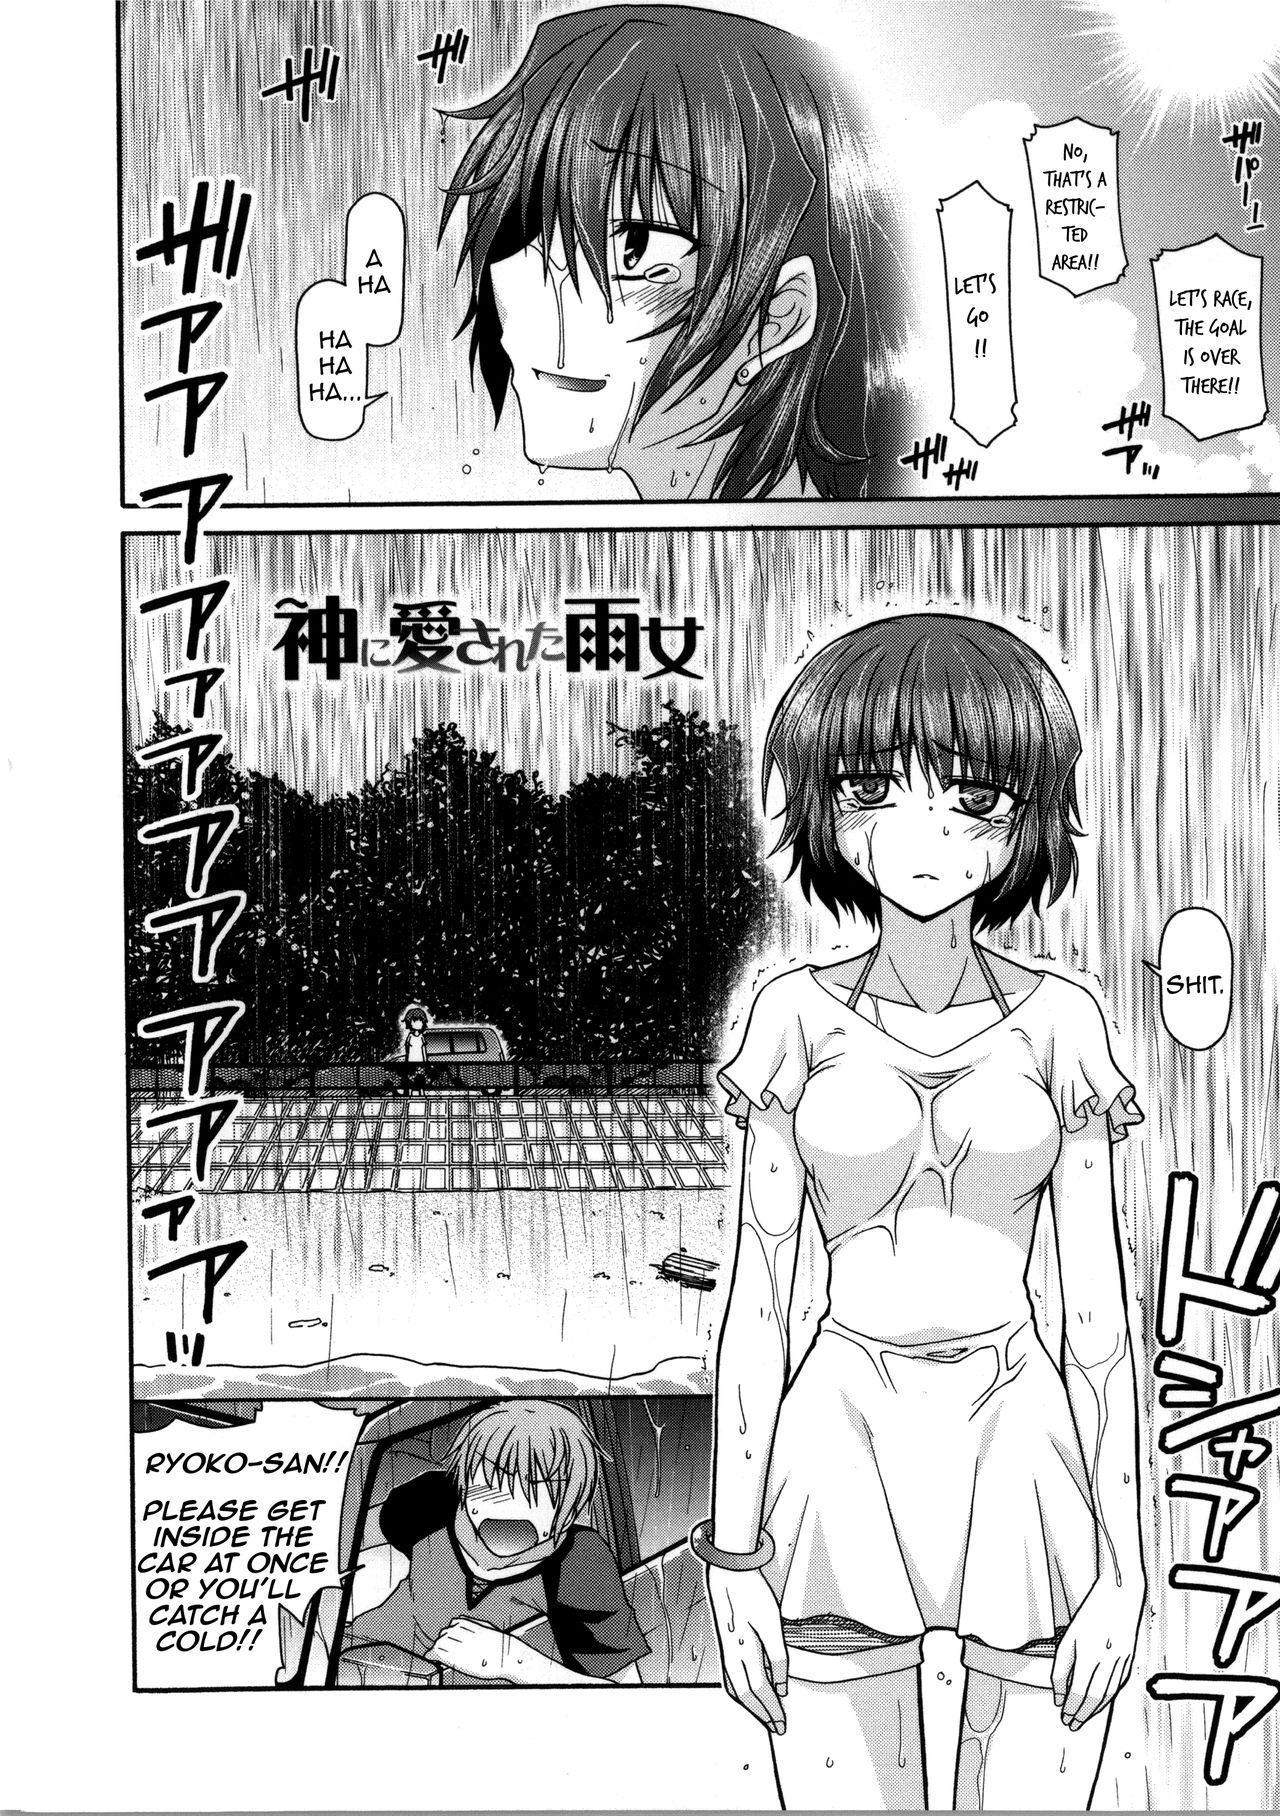 [Miyashiro Sousuke] Yamato Nadeshiko Chichi Henge - Yamato Nadeshiko Breast Changes Ch. 0-1, 4, 7-9 [English] 6